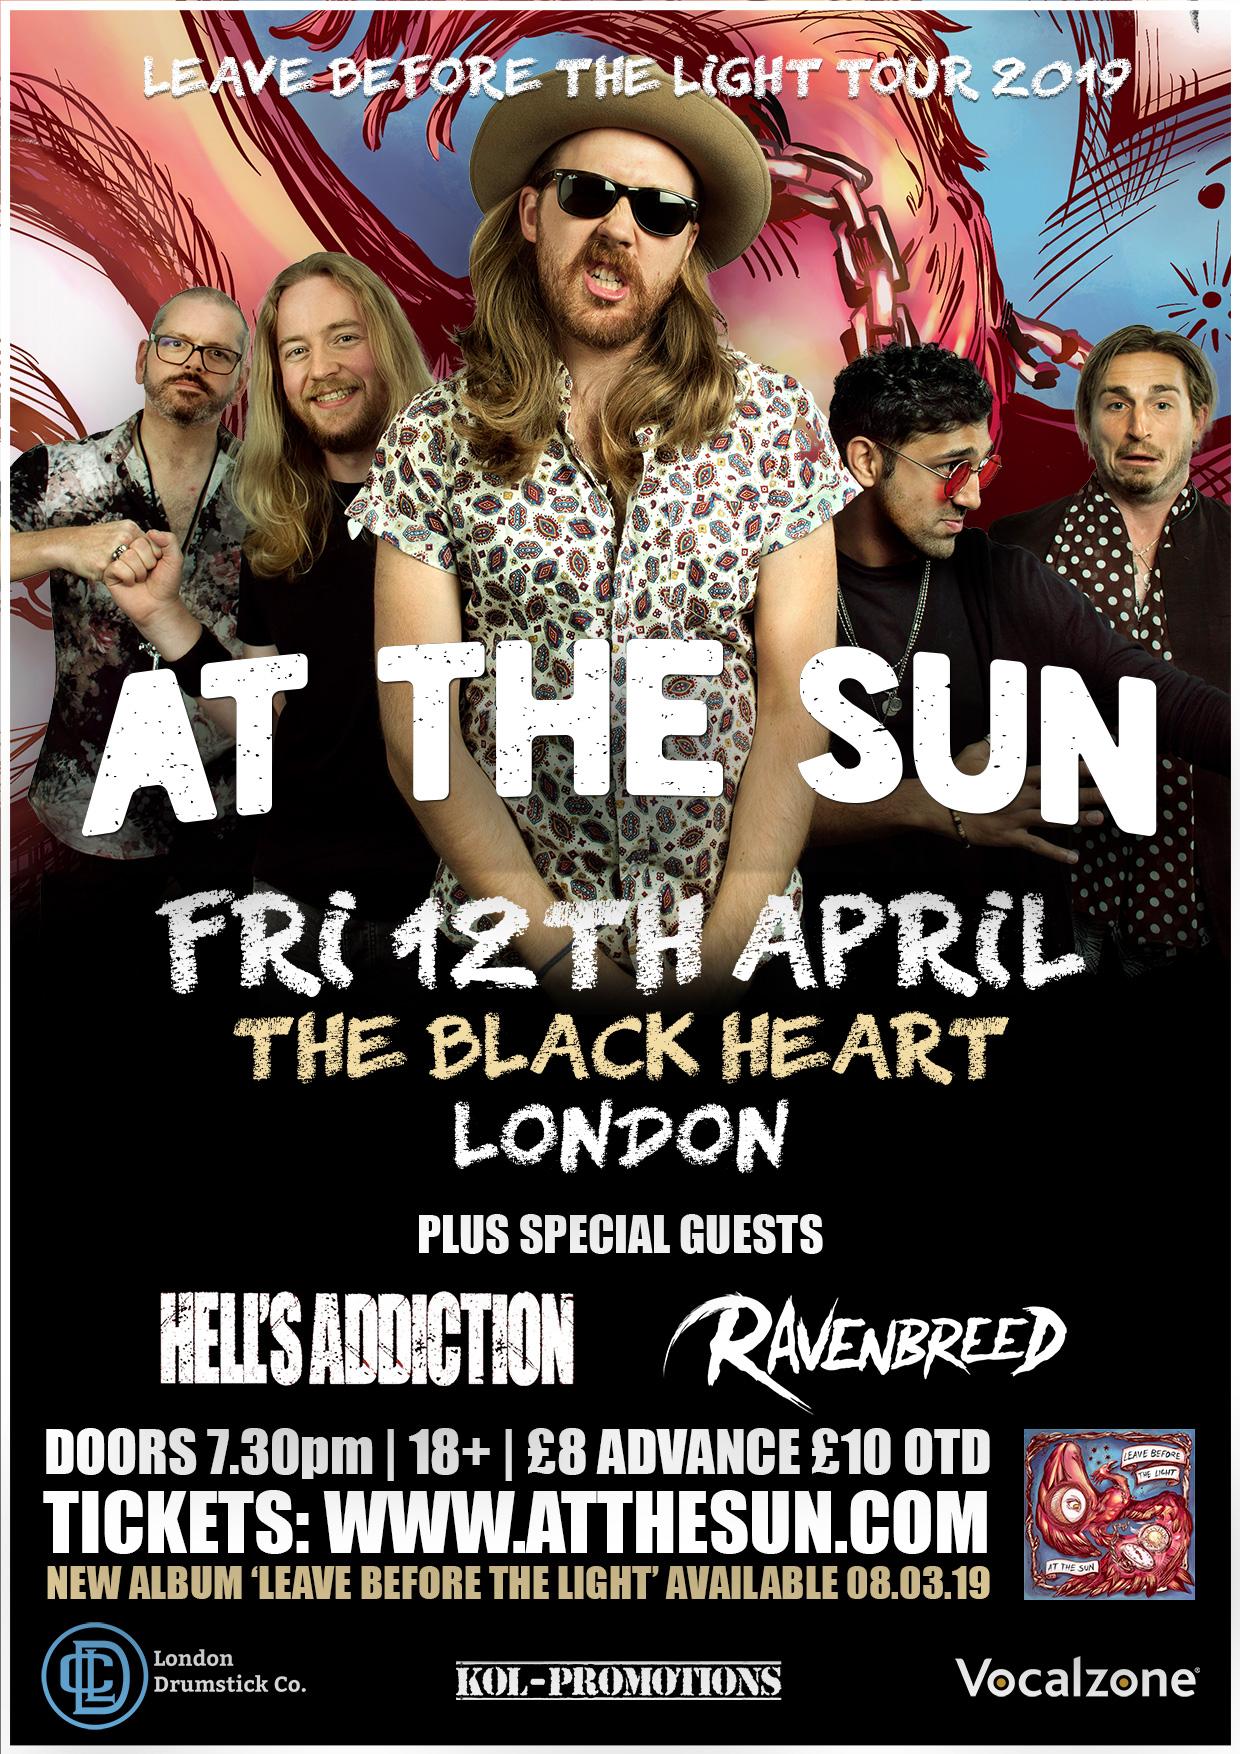 ATS-The Black Heart - London Tour Poster.jpg